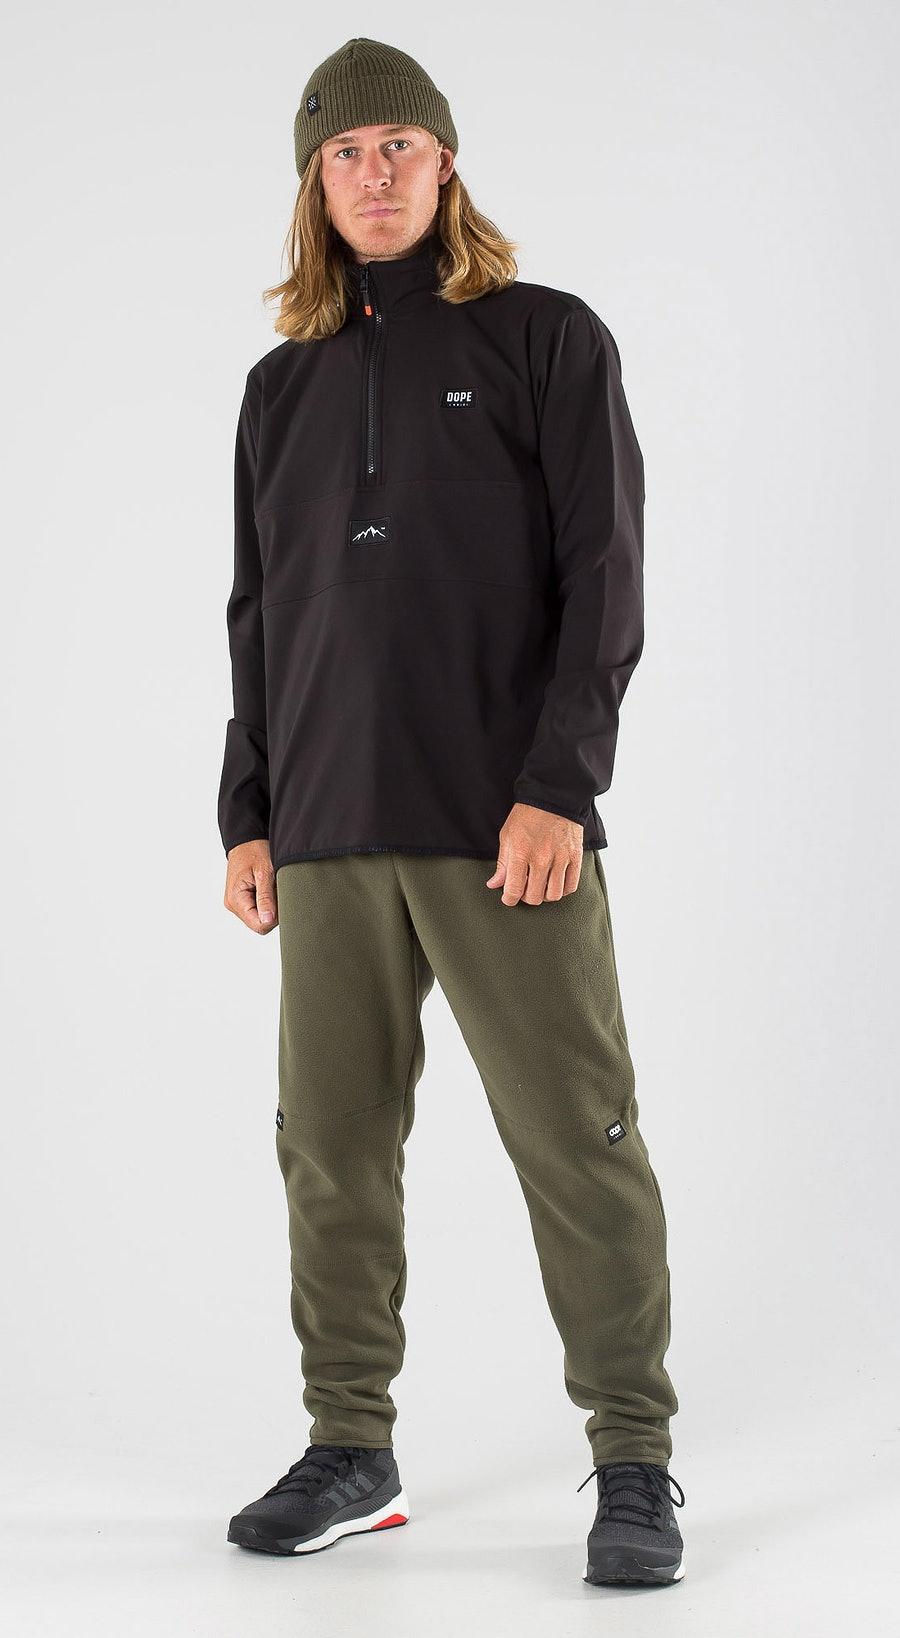 Dope Floyd Black Outfit Multi